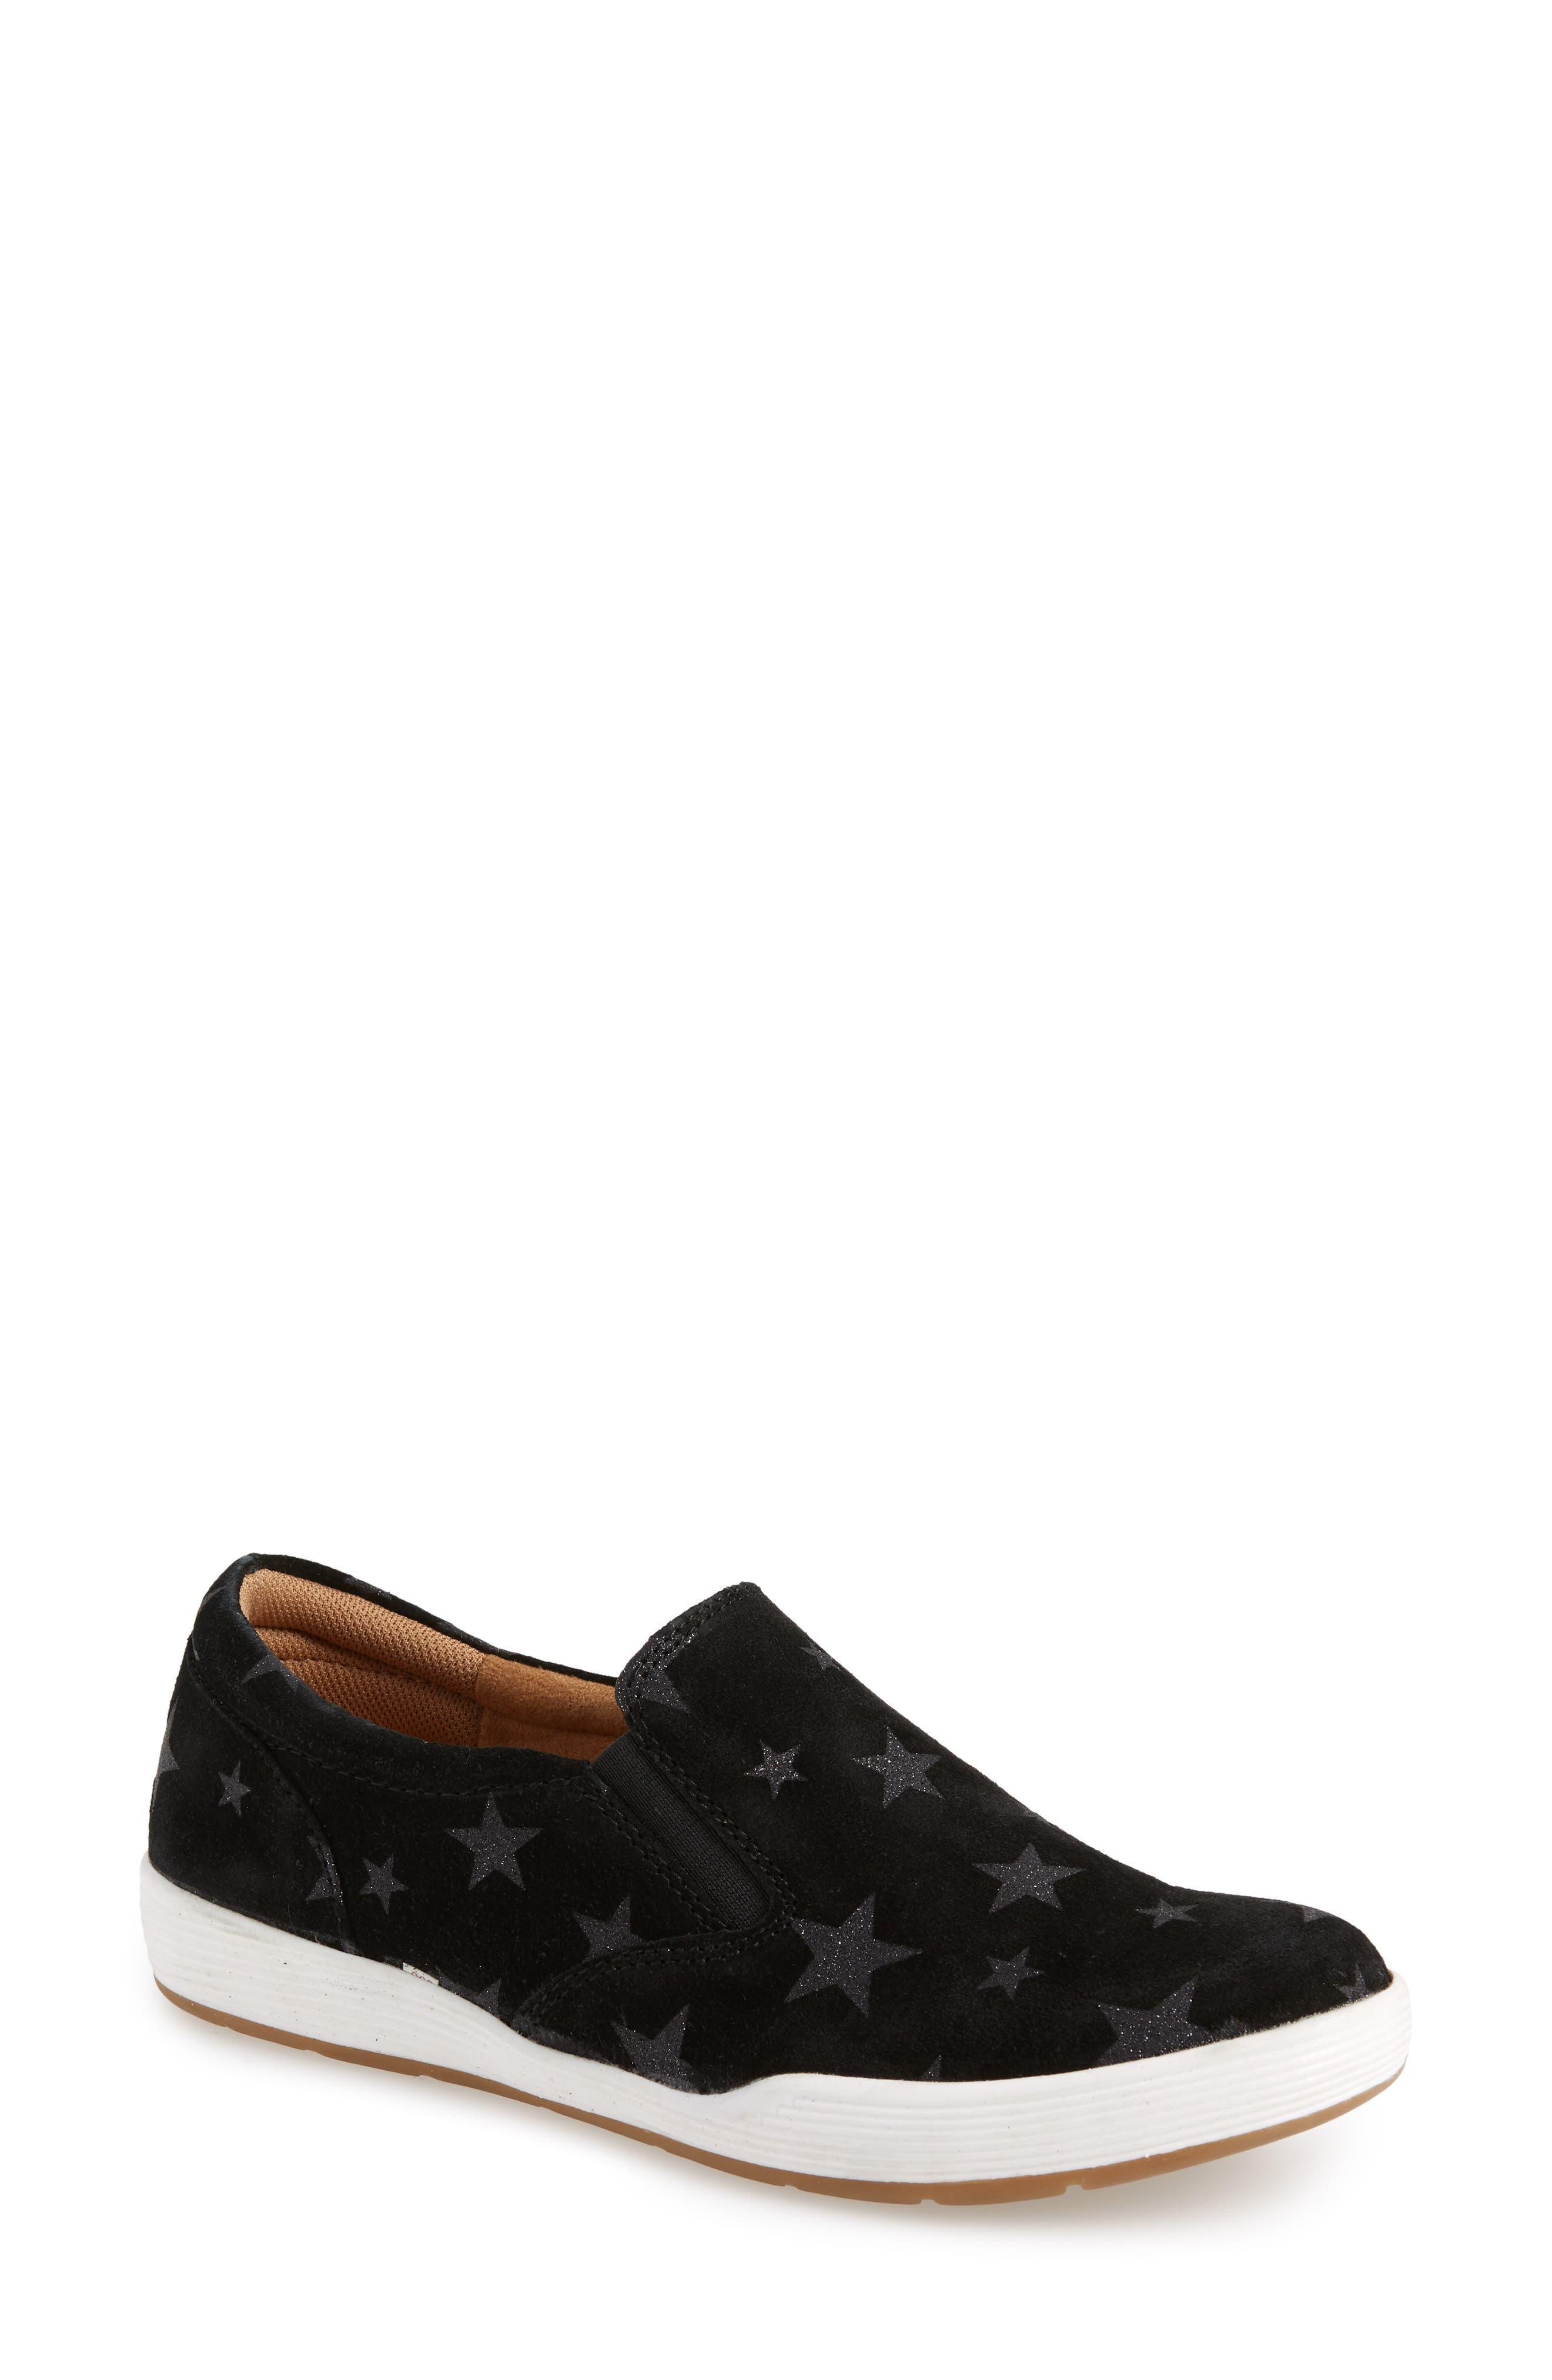 Linette Suede Slip-On Sneaker,                             Main thumbnail 1, color,                             BLACK SUEDE